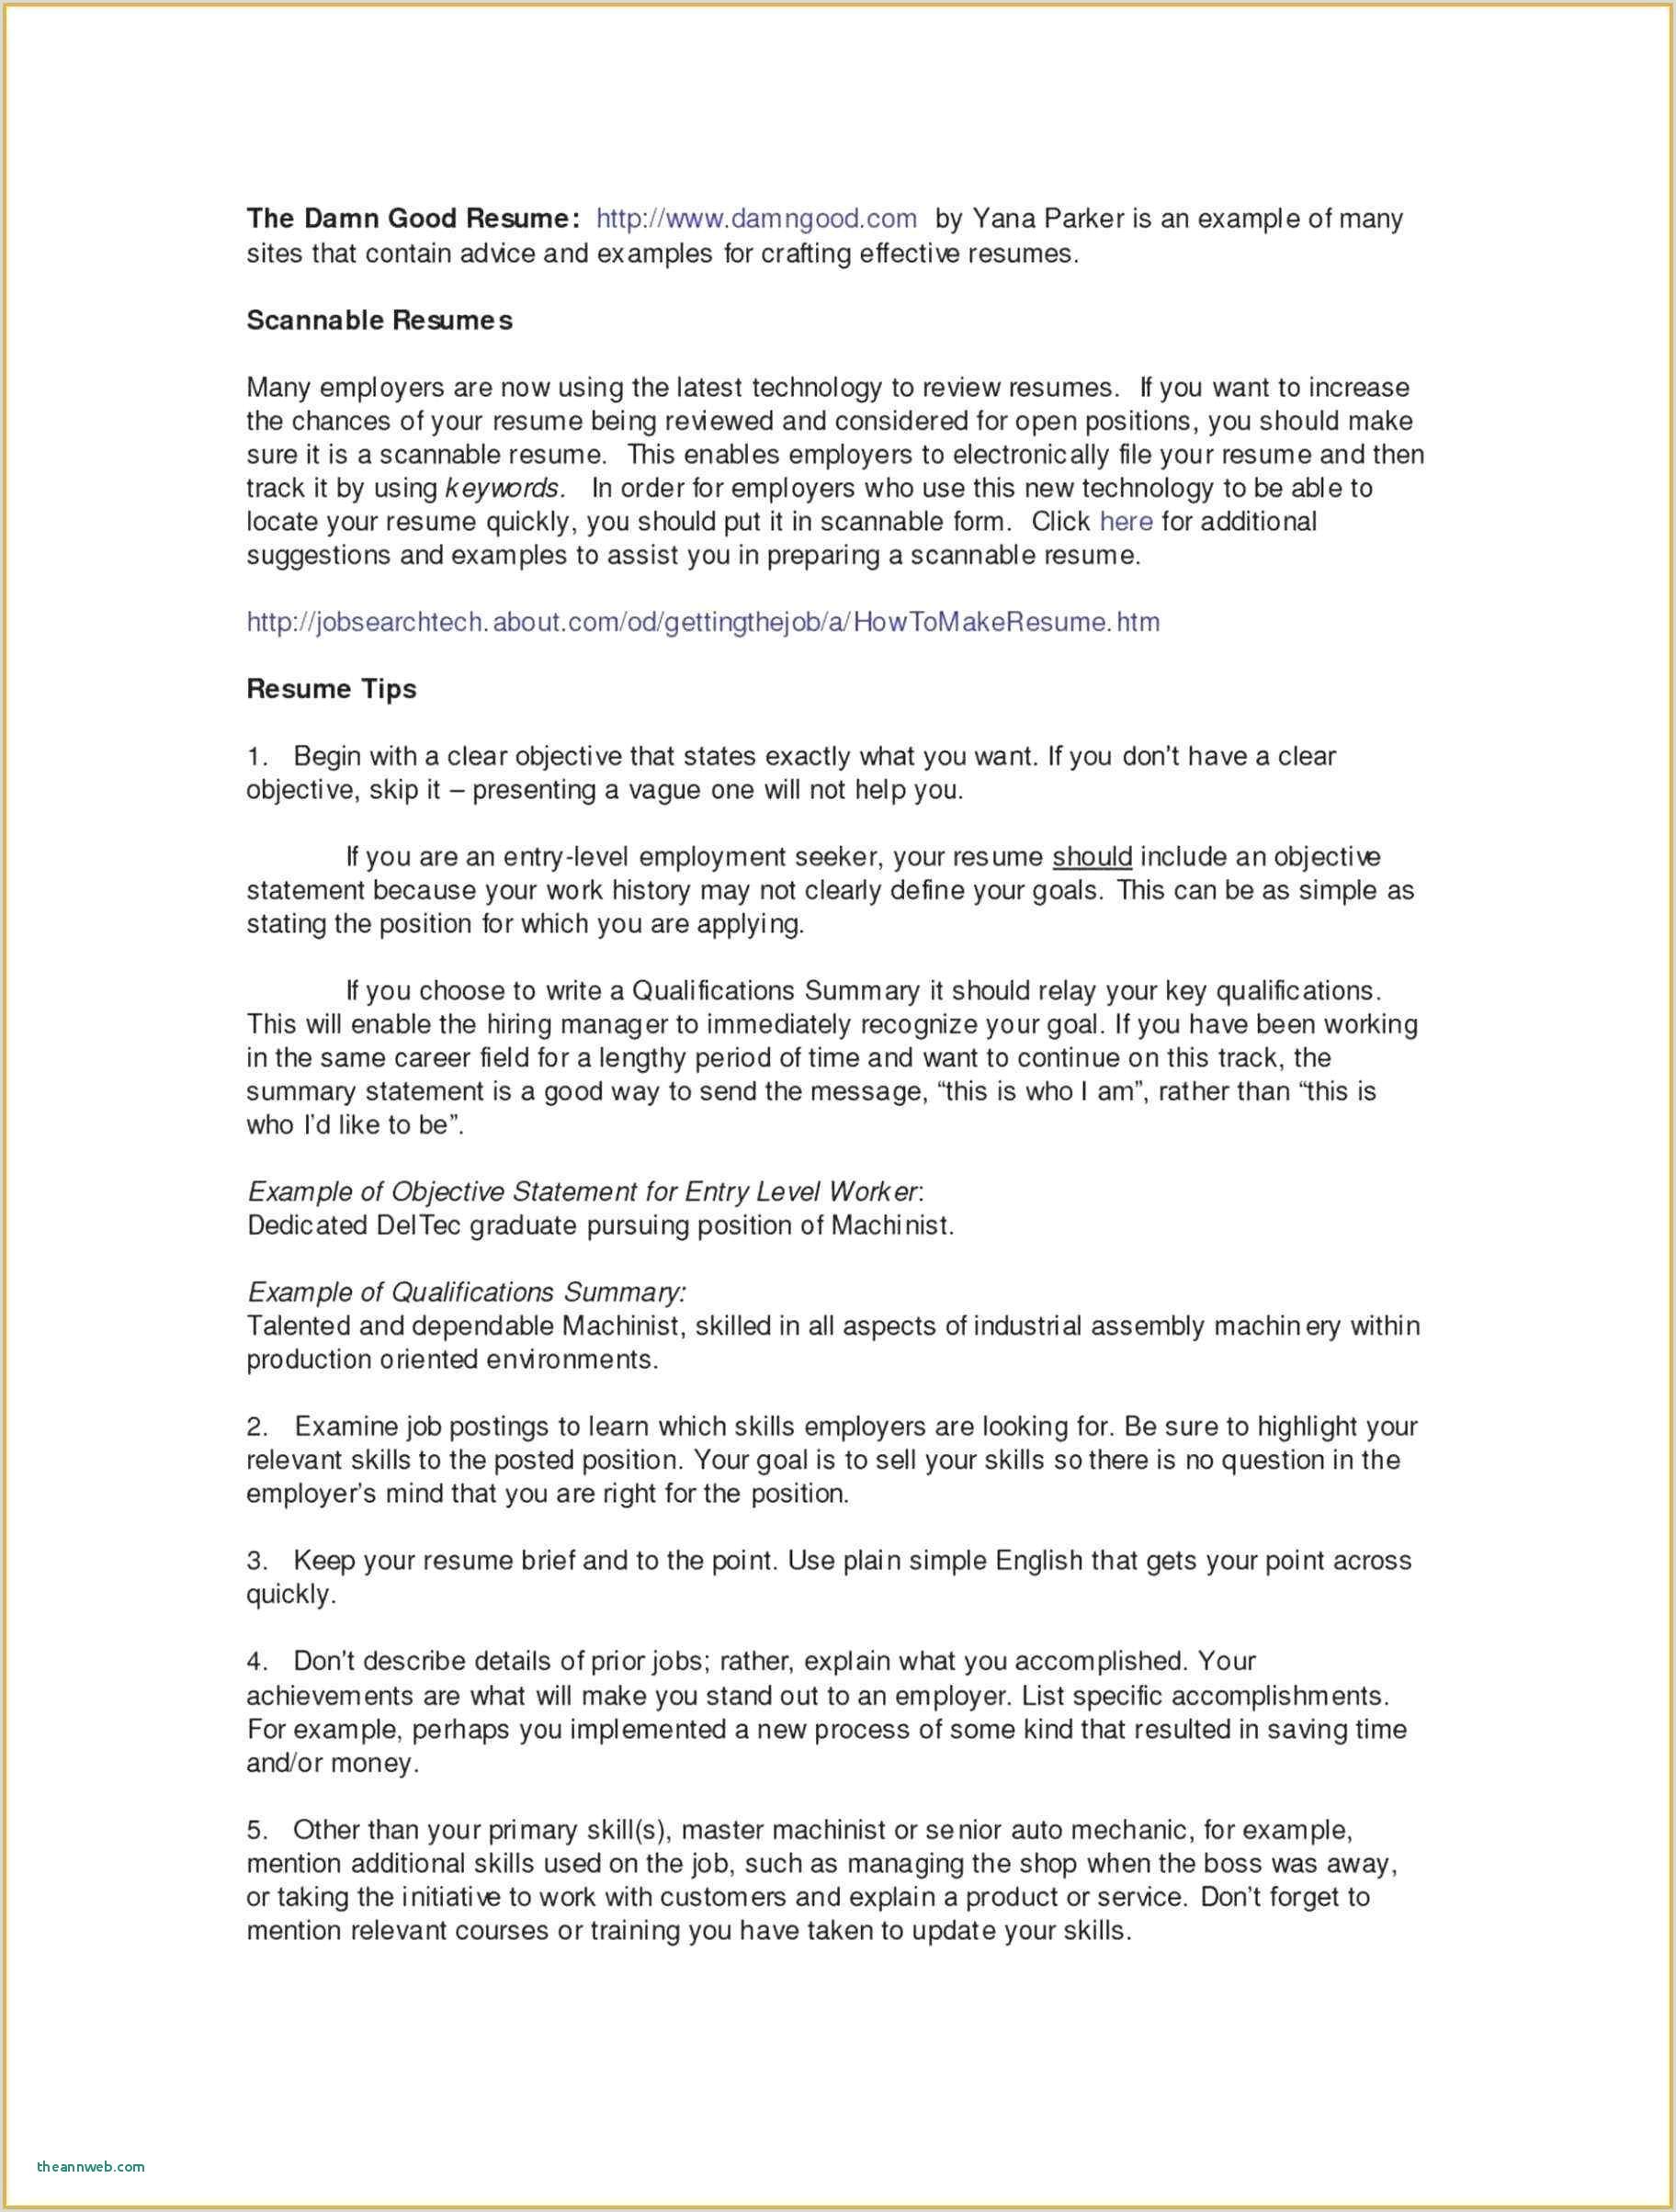 Resumes for Legal Secretaries Best Sample Cover Letter